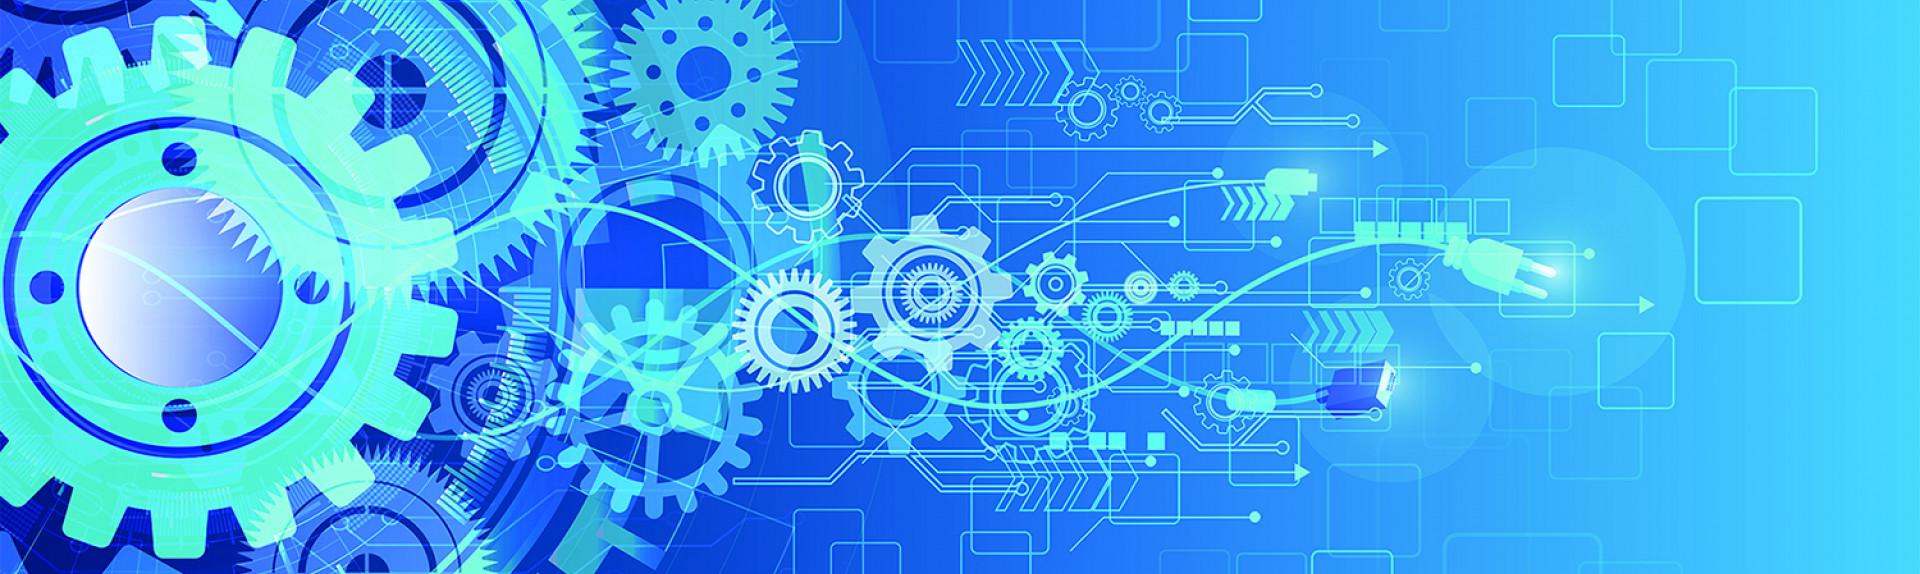 VWA-Zertifikatslehrgang Ingenieurwissen Basics für Kaufleute